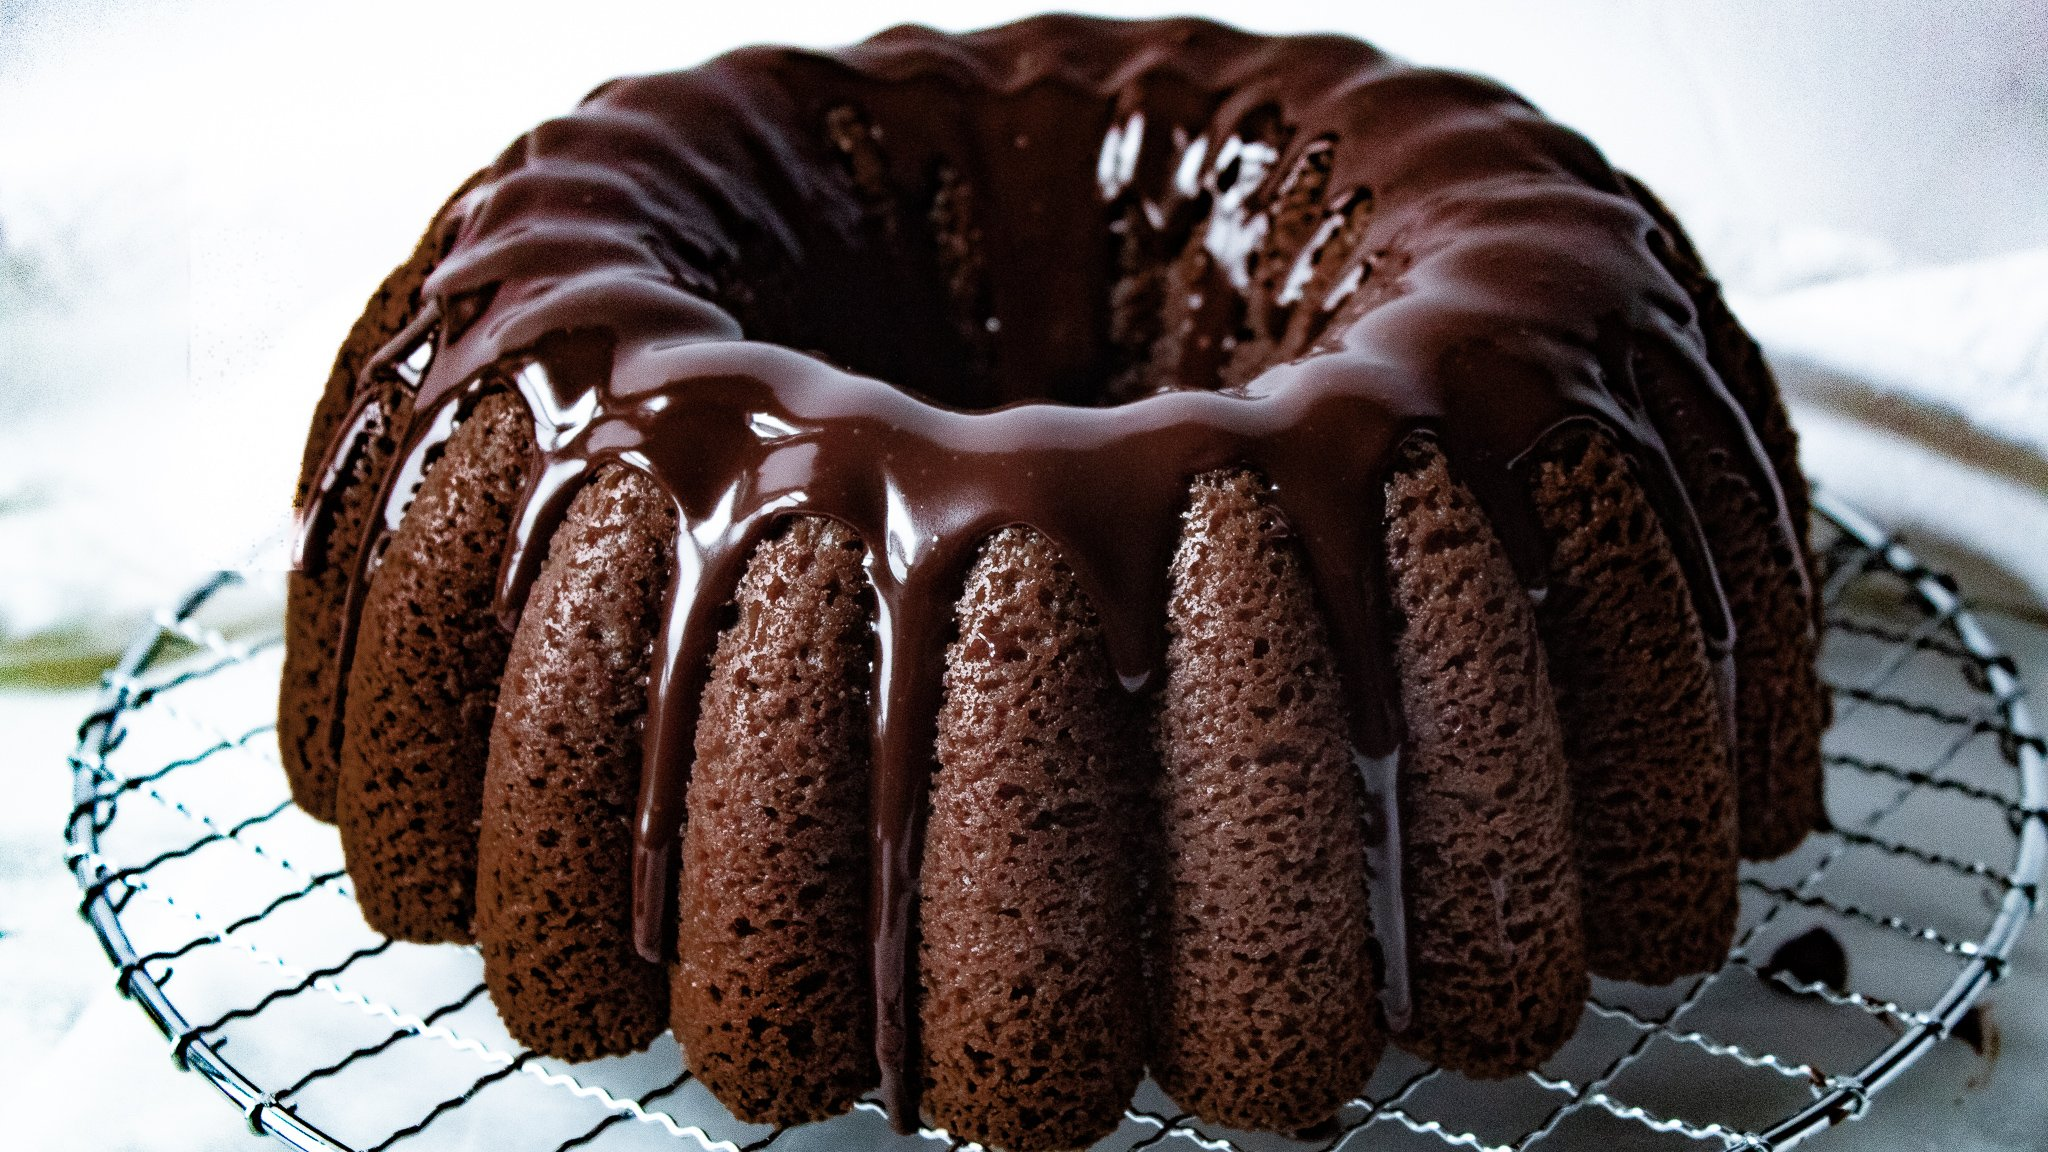 Chocolate Sour Cream Pound Cake Recipe - Moist Bundt from Scratch with Easy Glaze! | Chenée Today